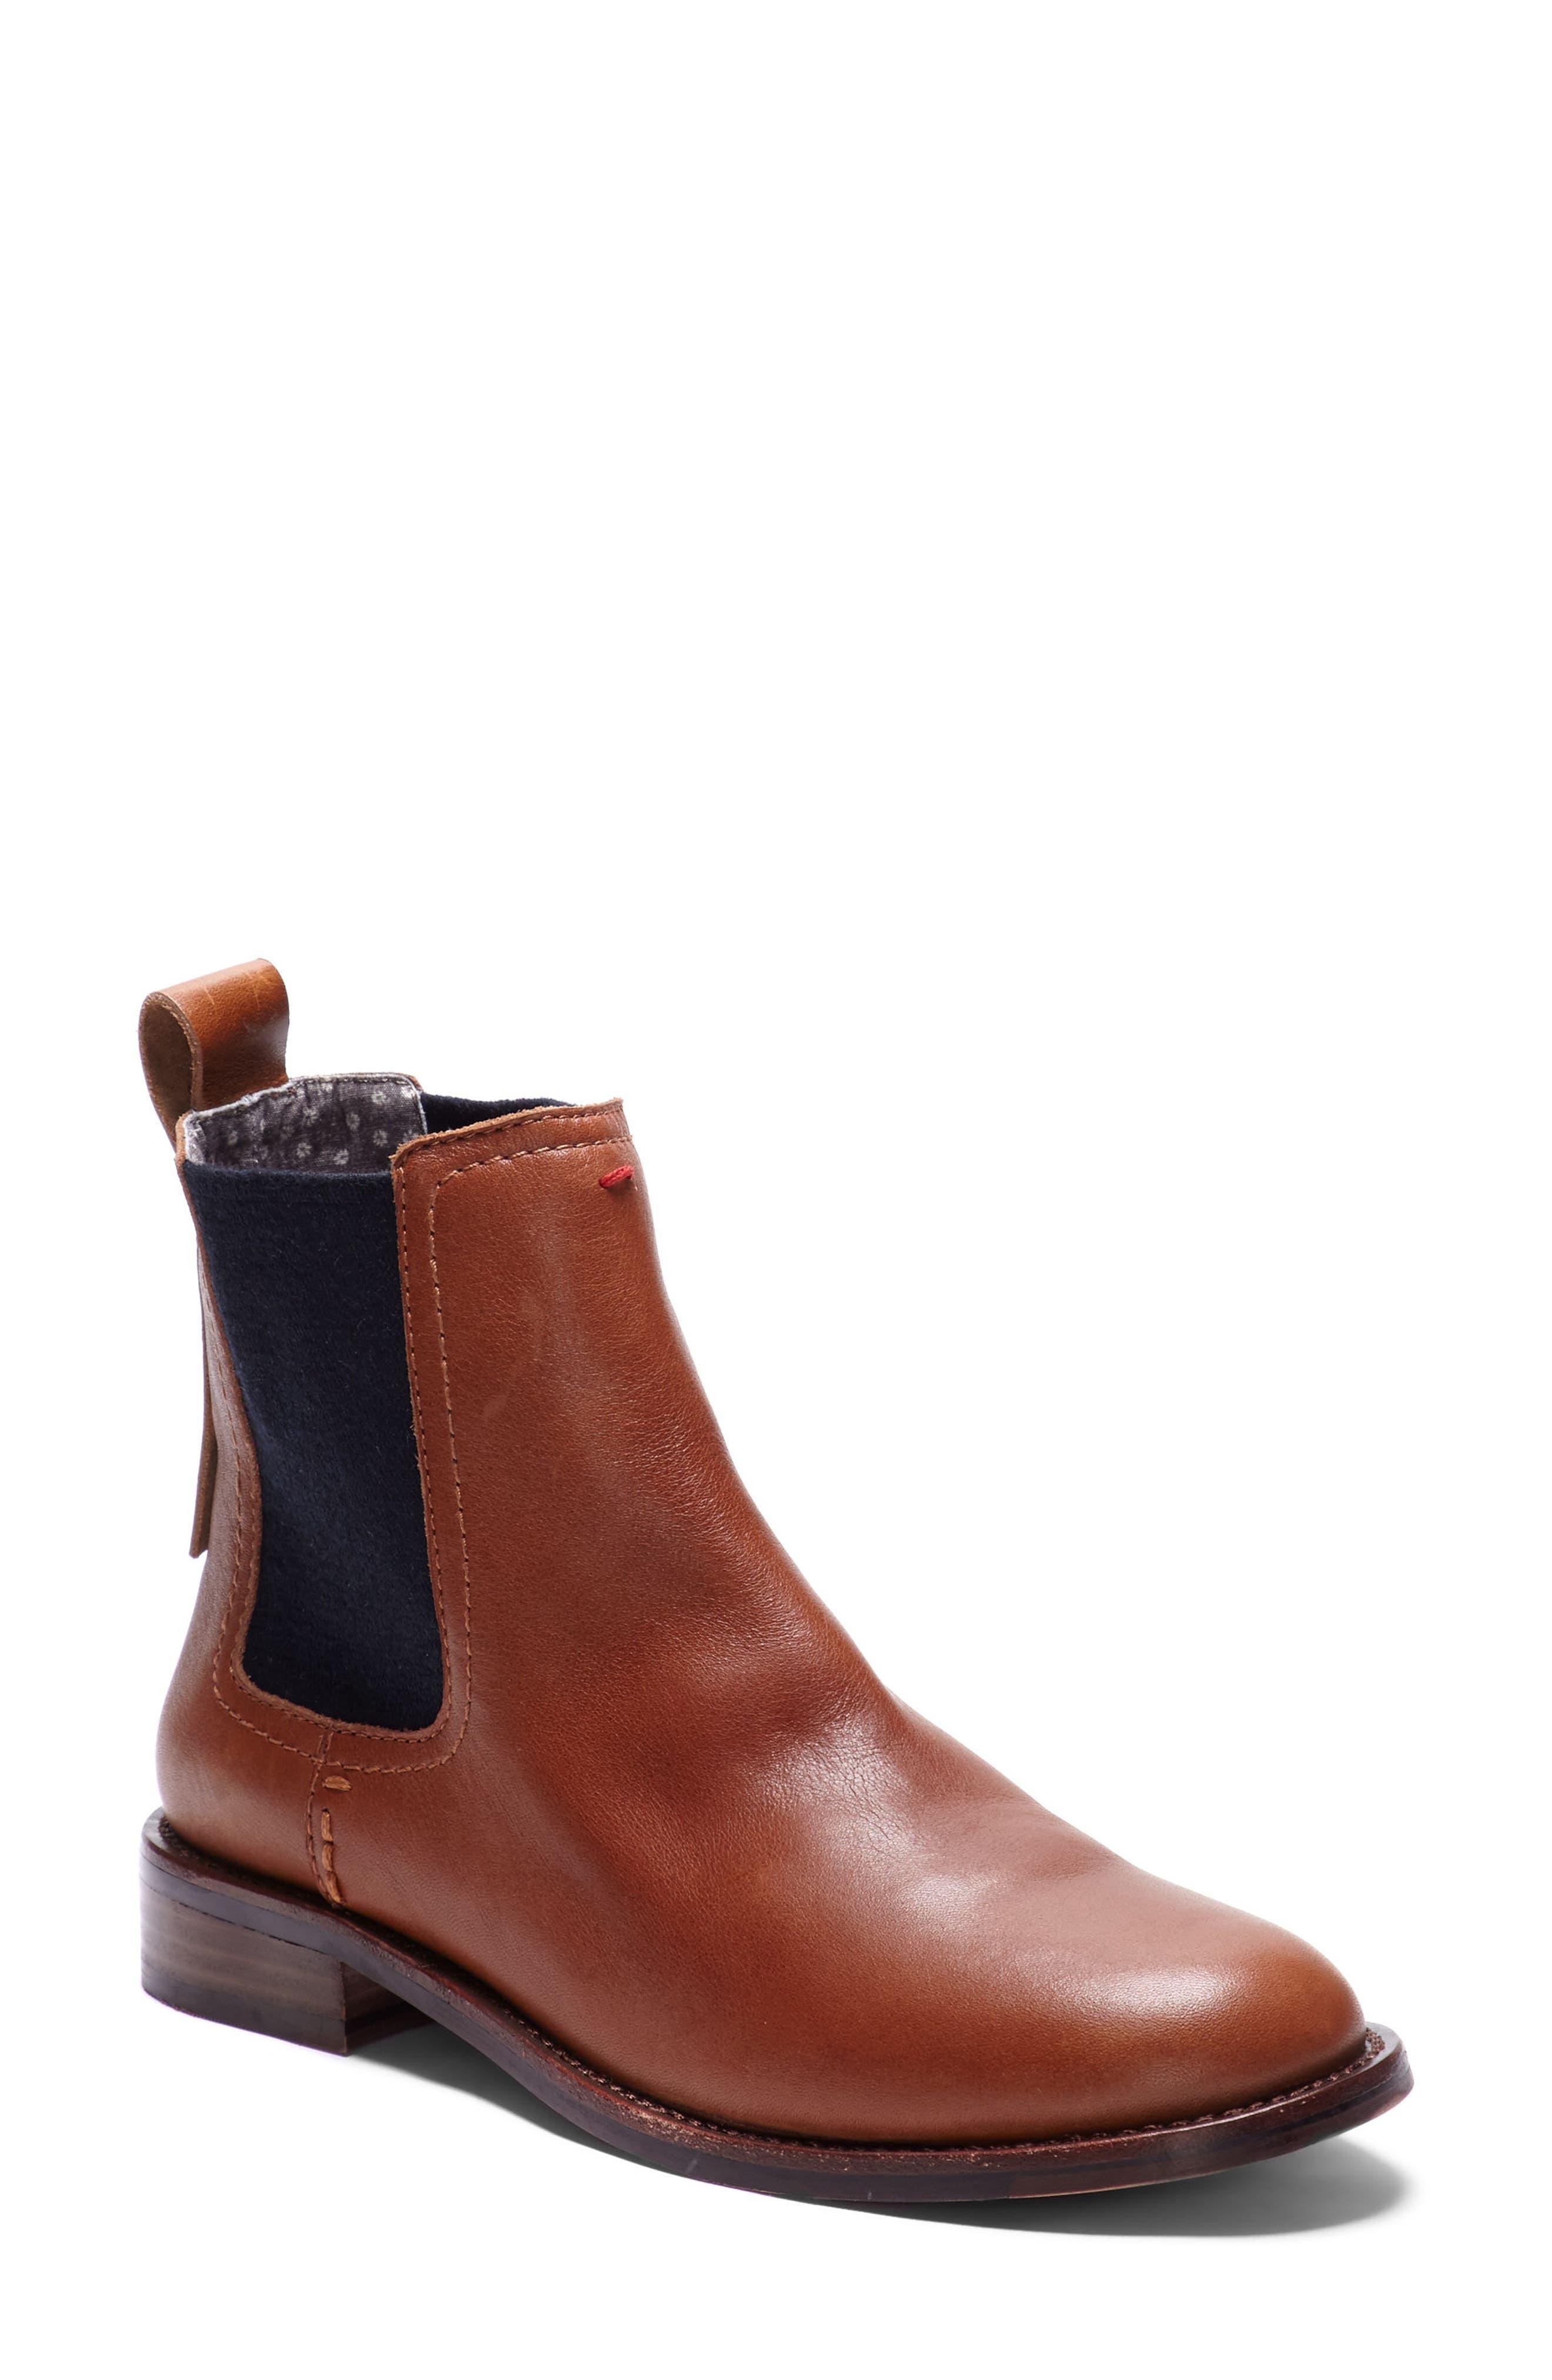 Zabi Chelsea Boot,                             Main thumbnail 1, color,                             Yam Leather